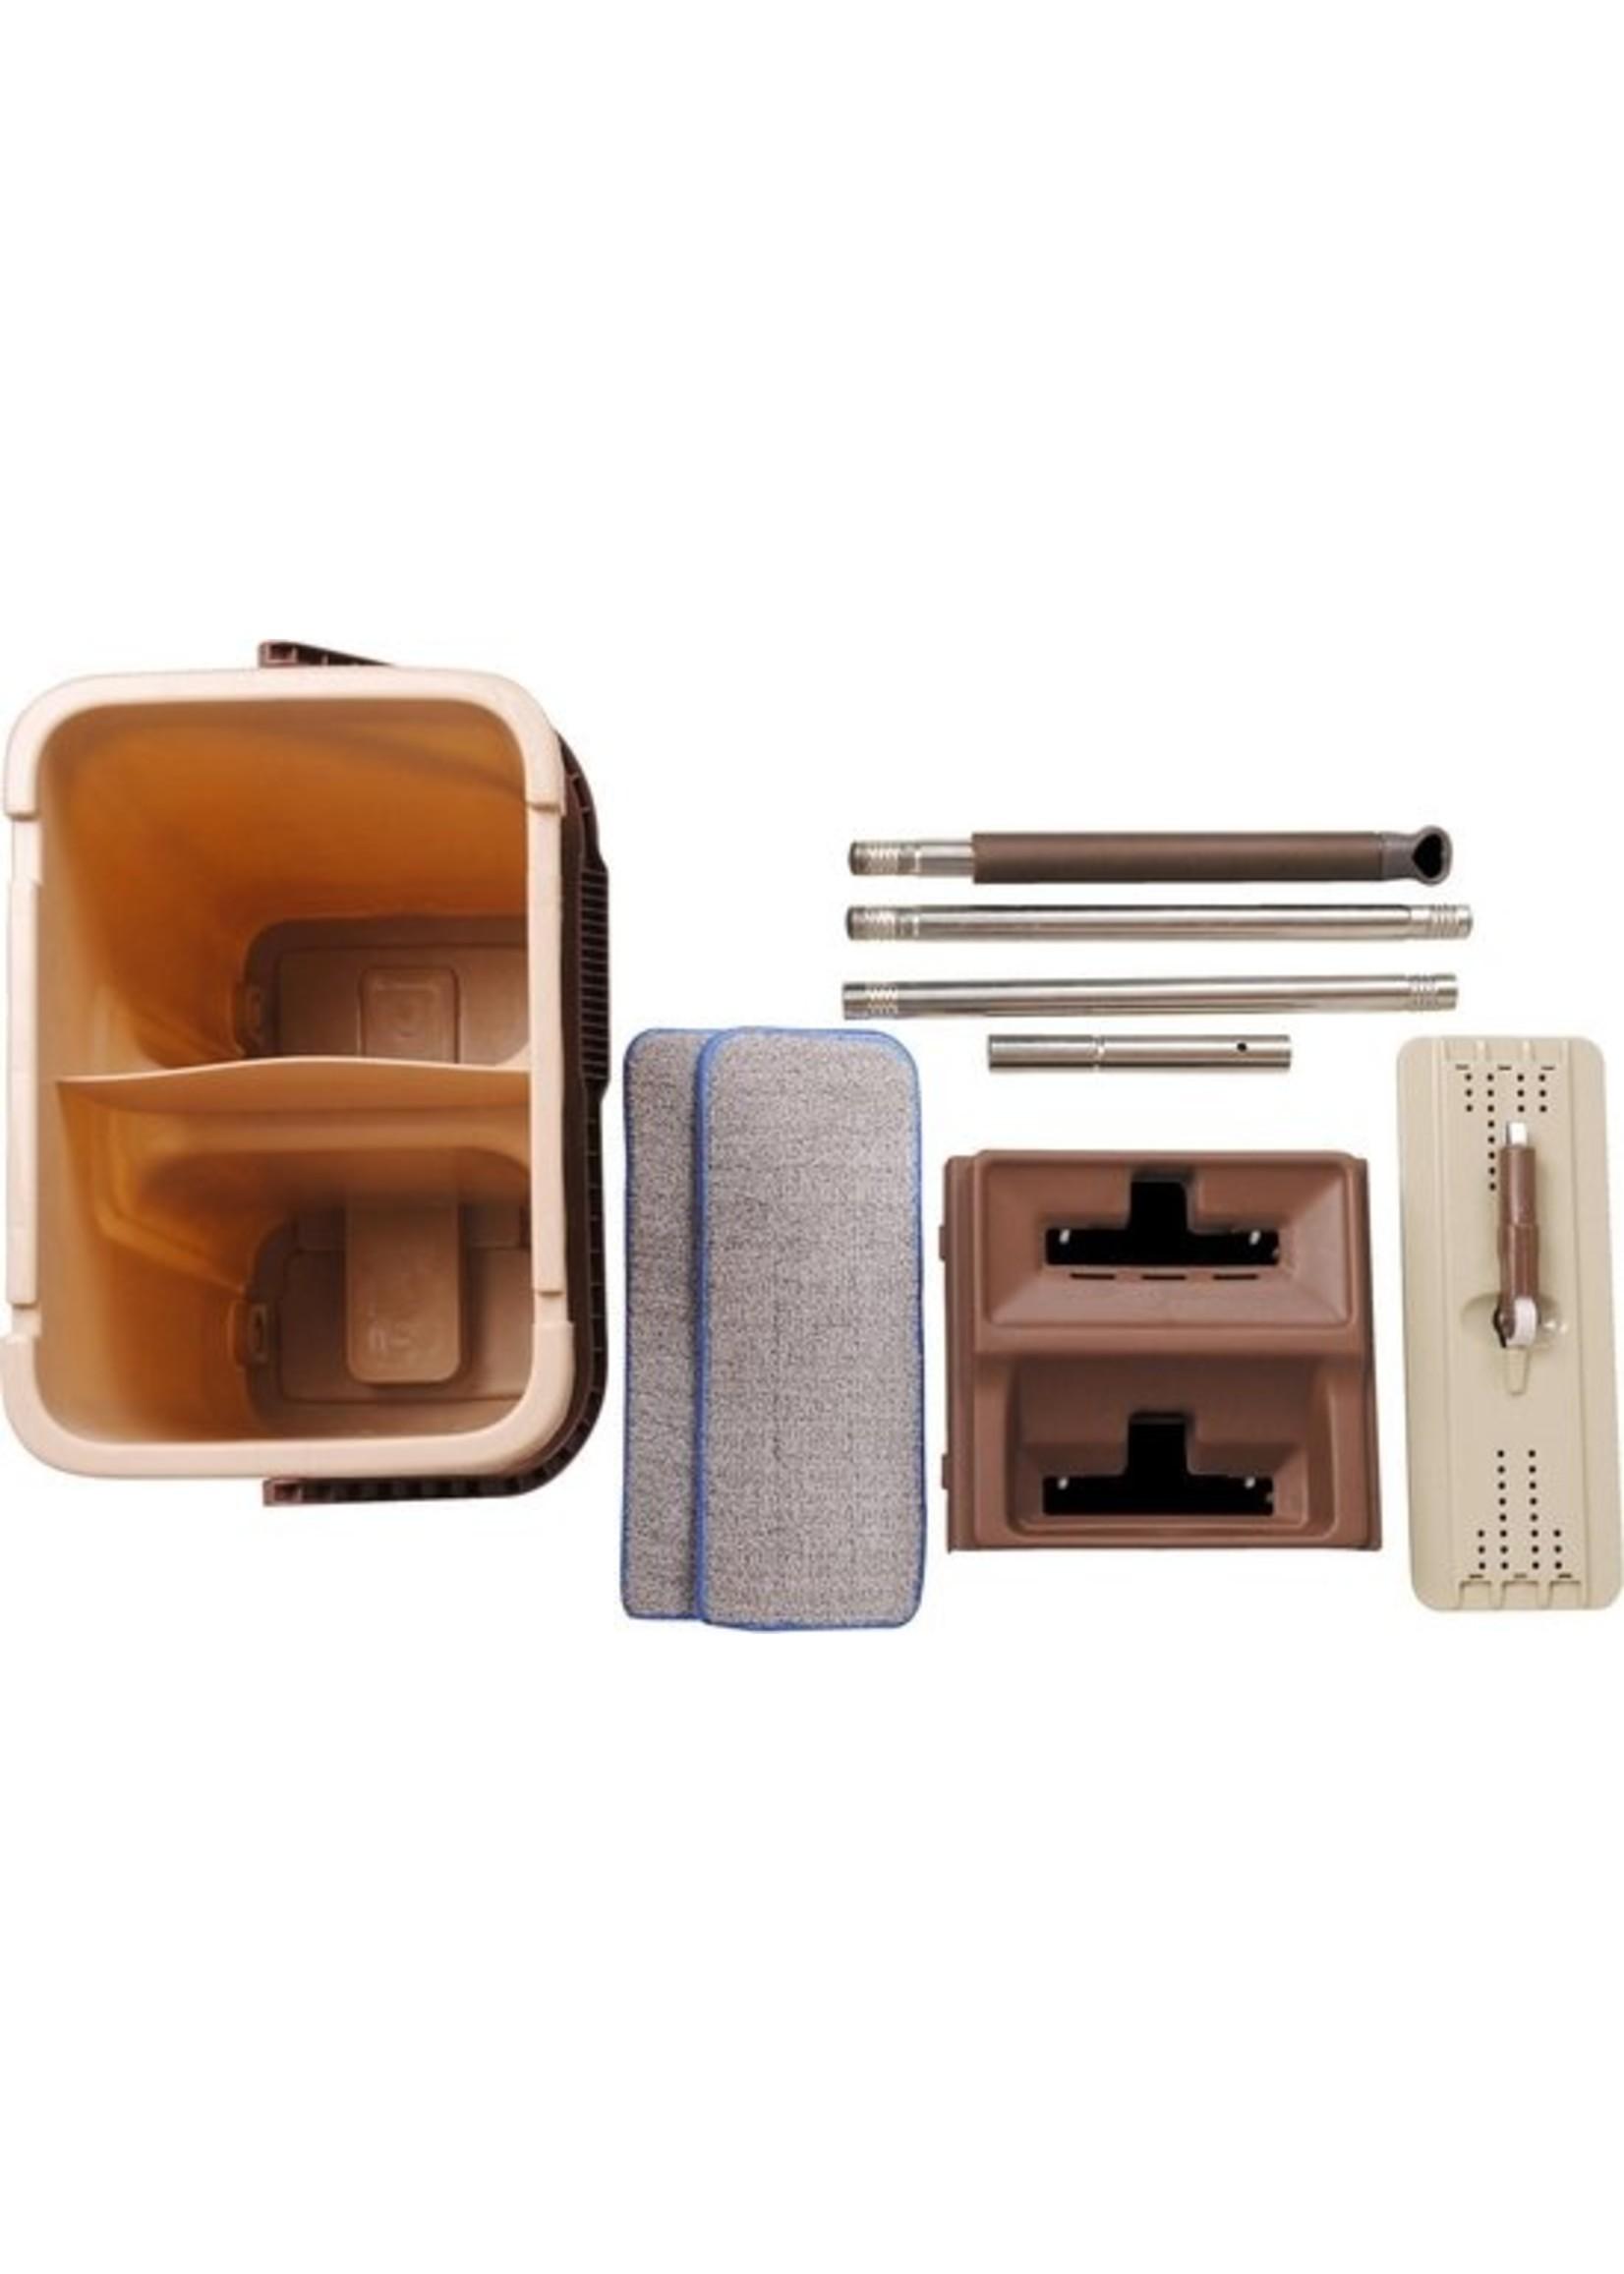 Cenocco Cenocco CC-9070 vlakke mop - Inclusief emmer - Bruin